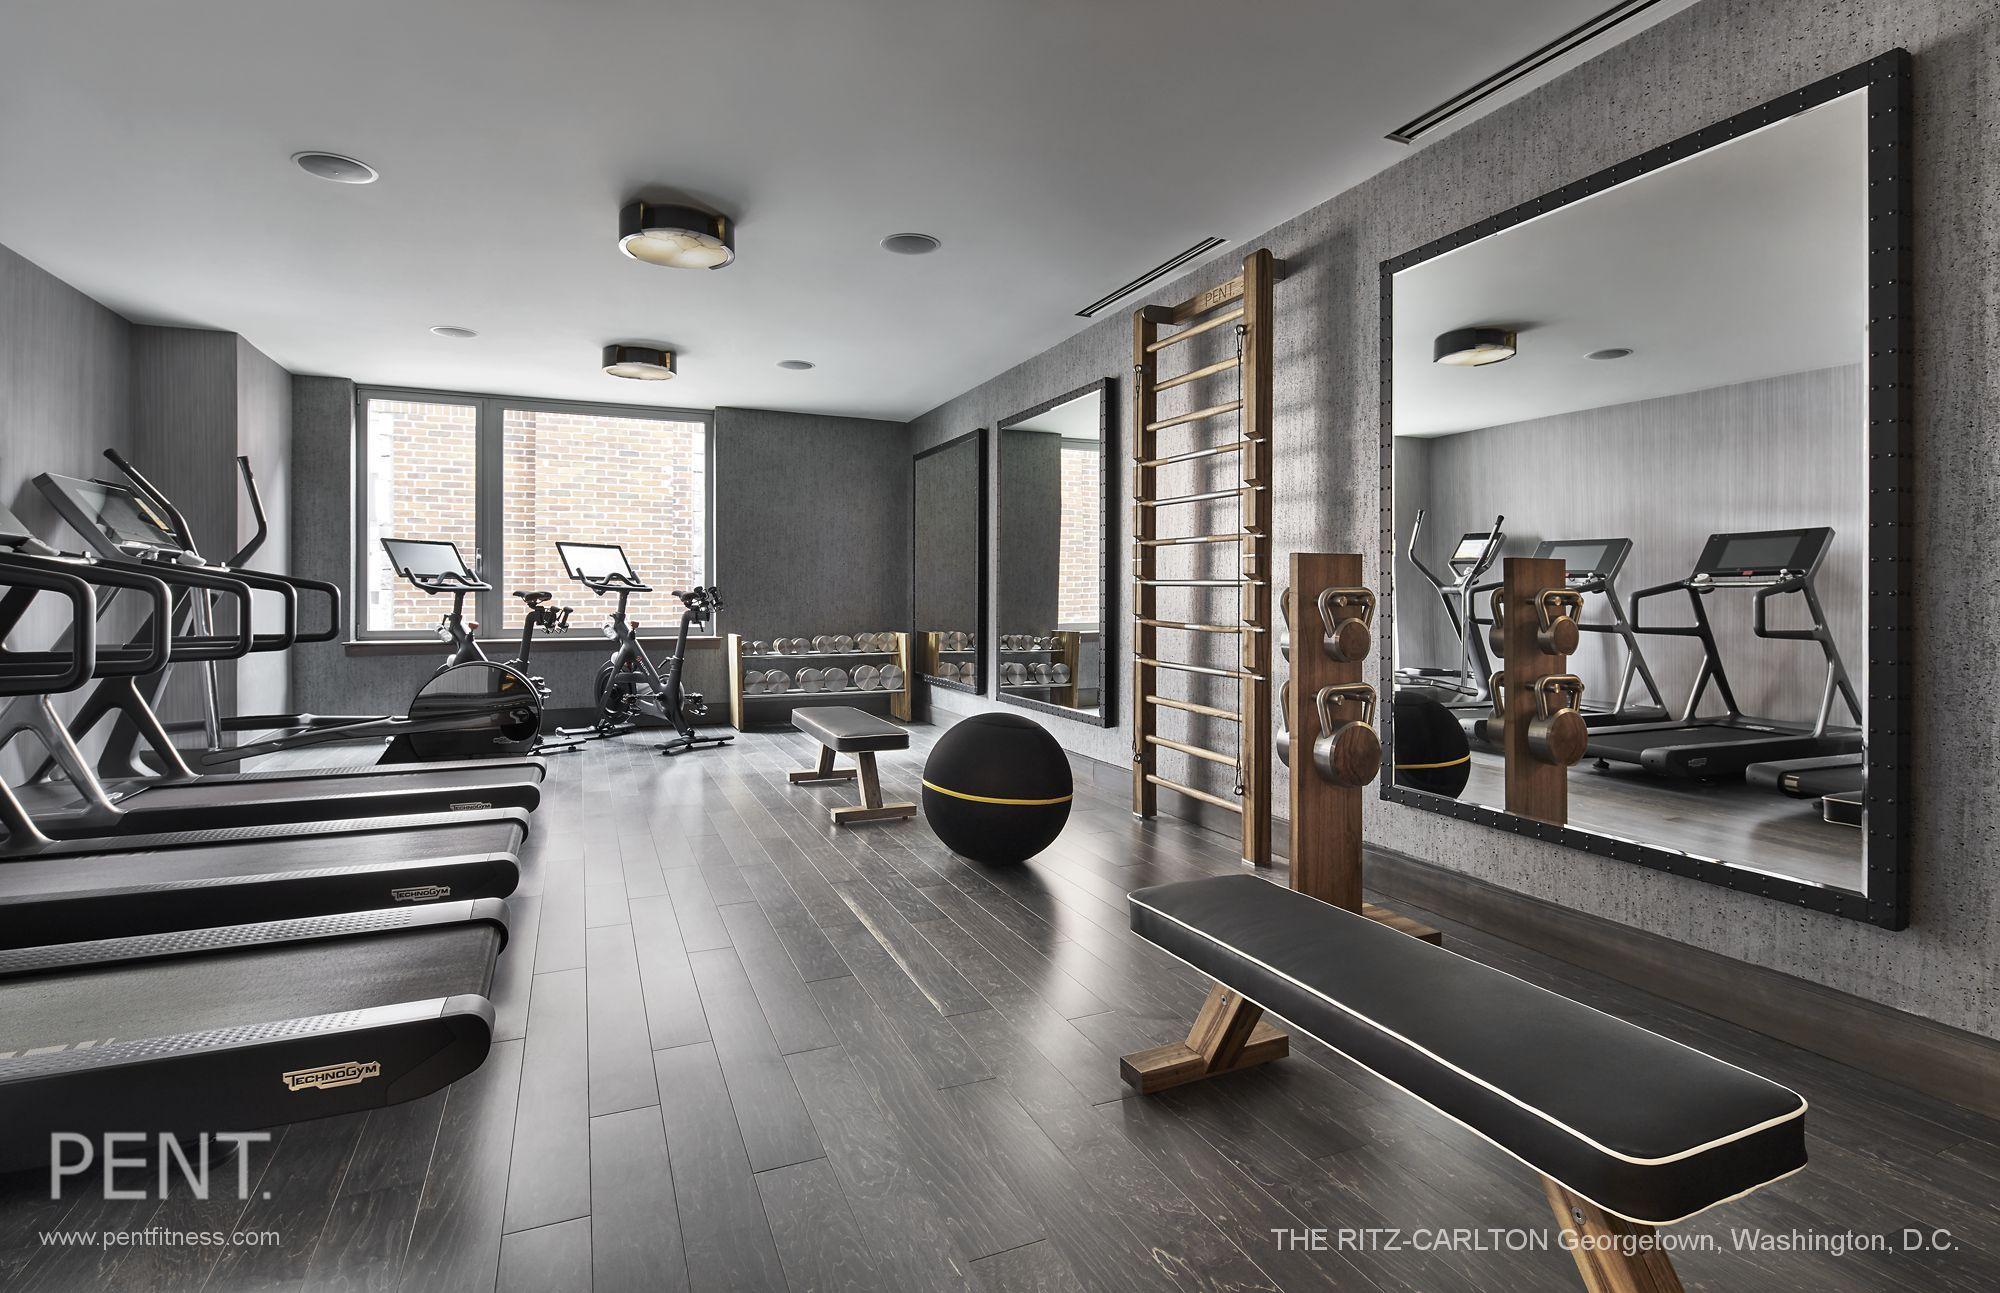 Tremendous Goplus Exercise Bike Cardio Fitness Gym Cycling Machine Gym Interior Design Ideas Skatsoteloinfo